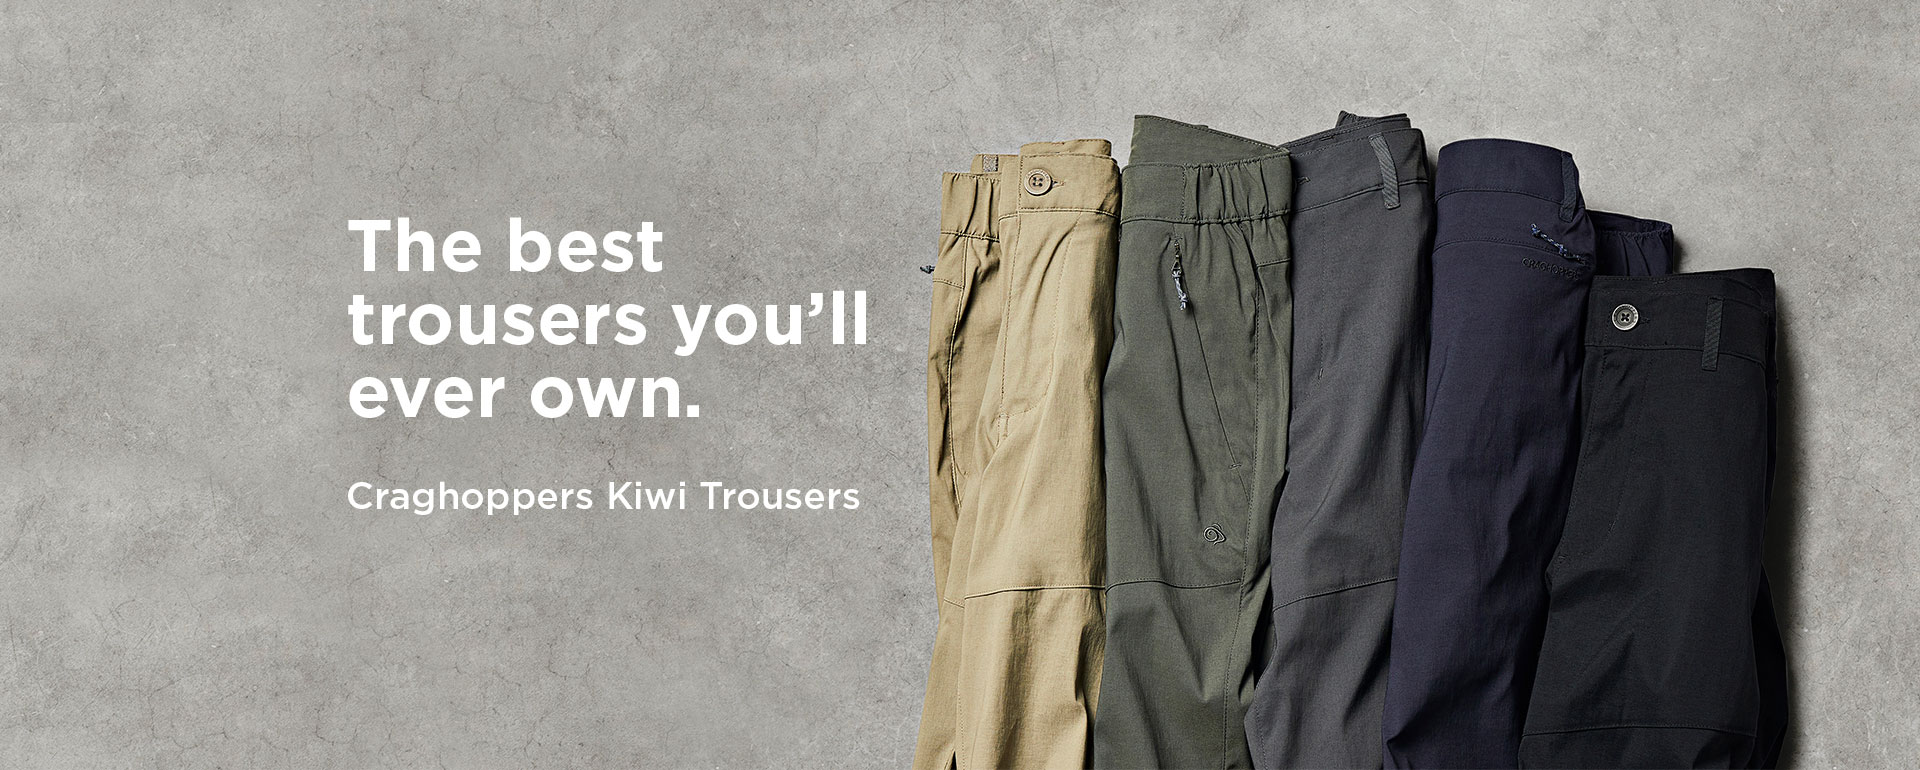 Kiwi Trousers